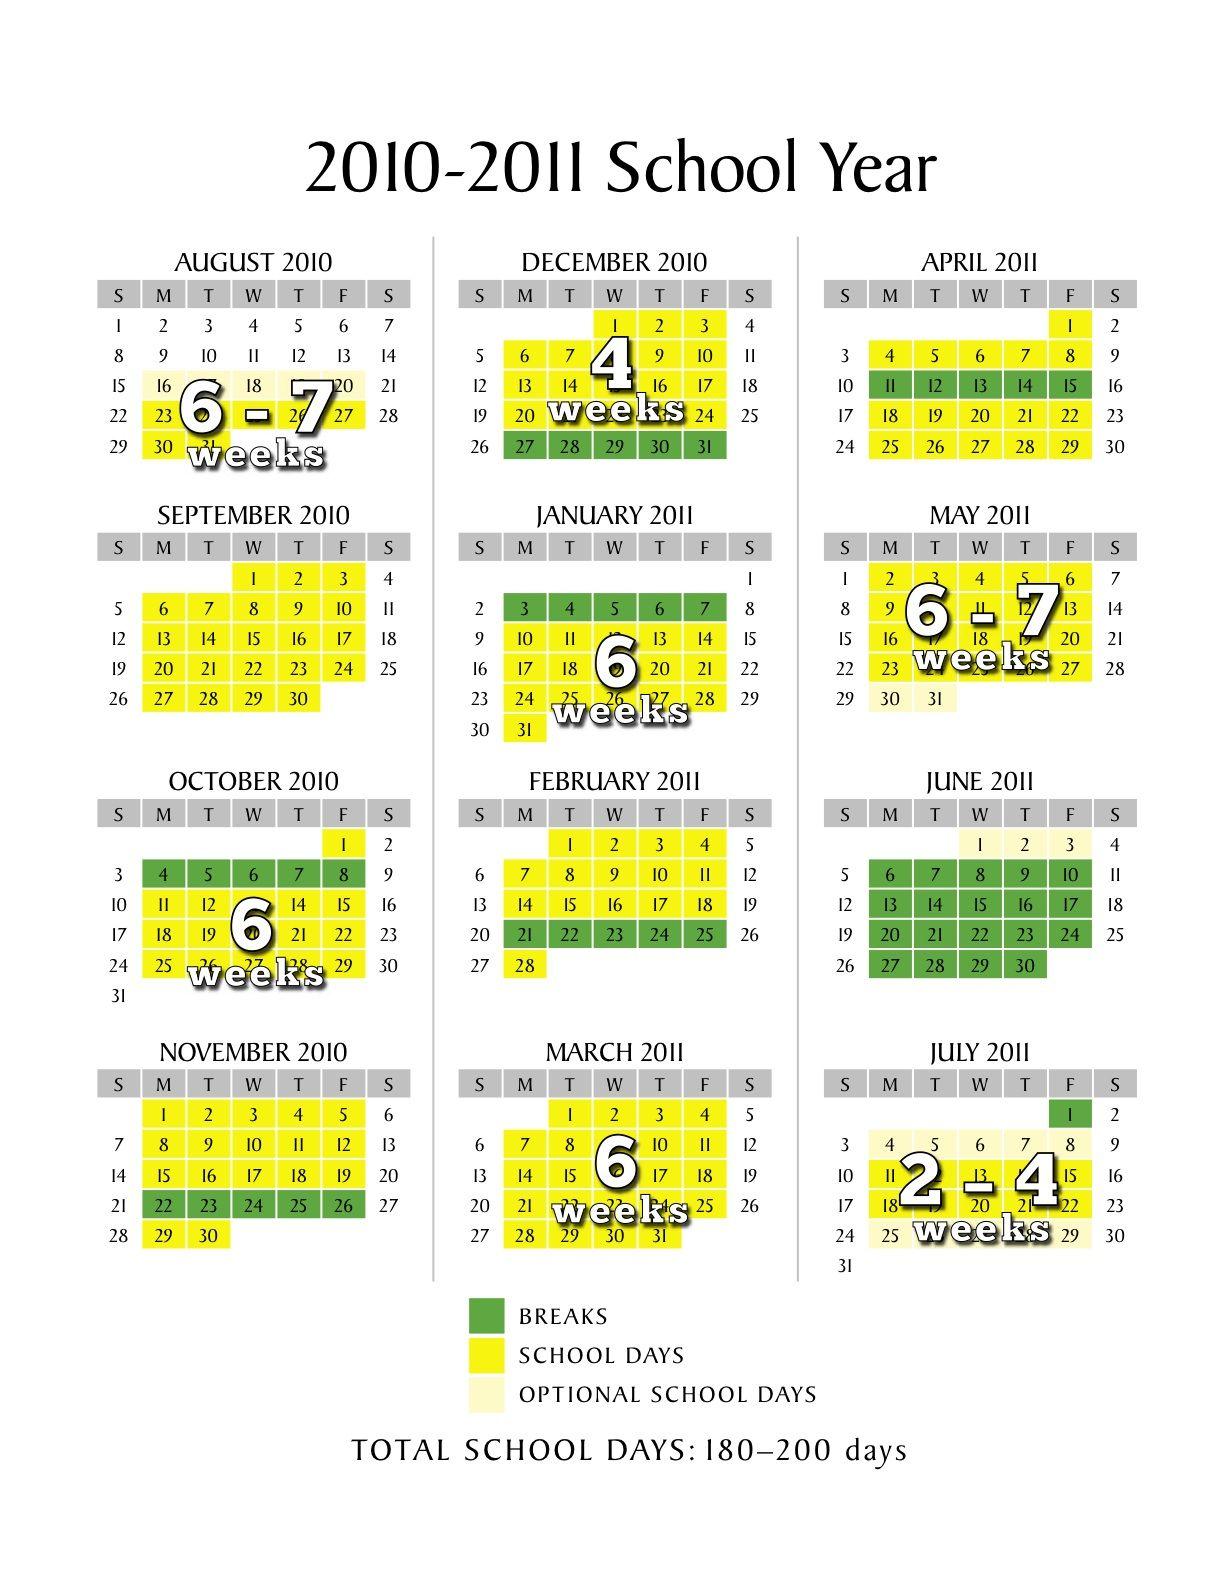 How many weeks in a school calendar year